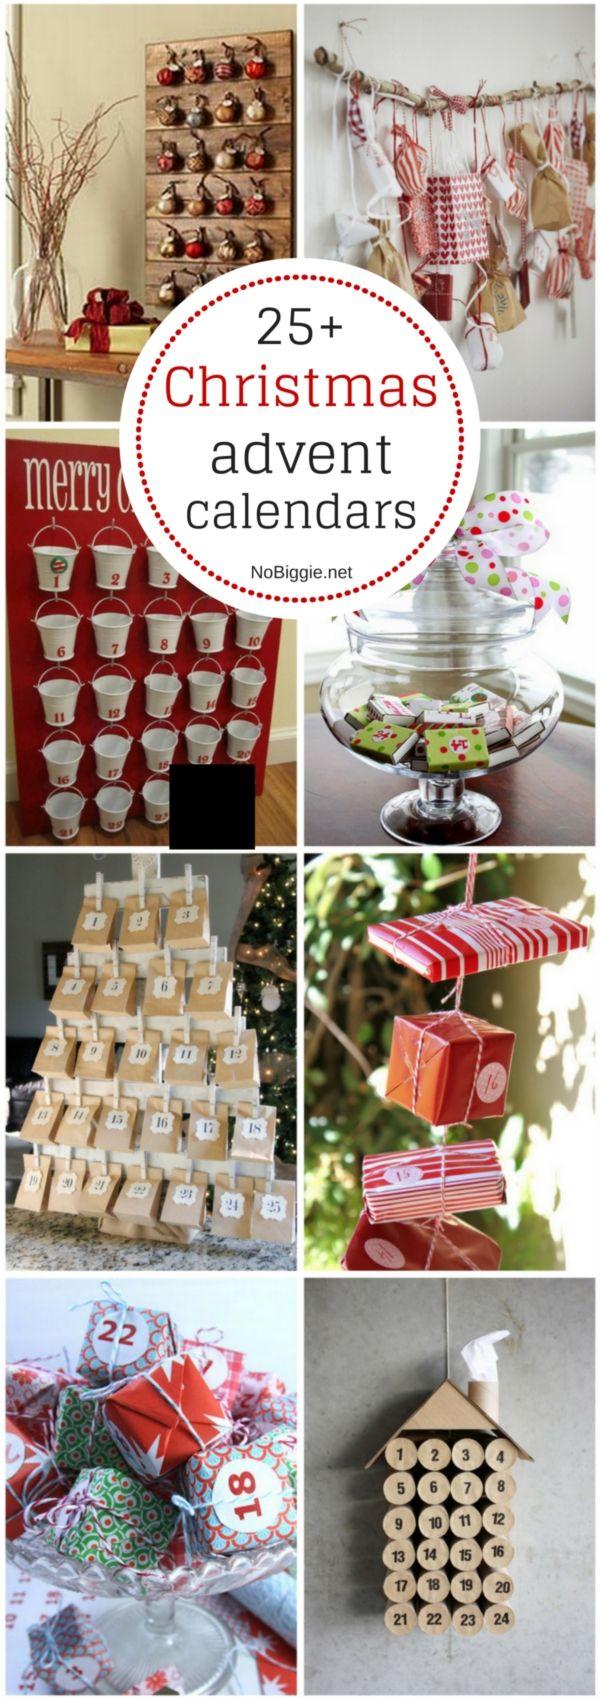 25+ Christmas advent calendars - NoBiggie.net: